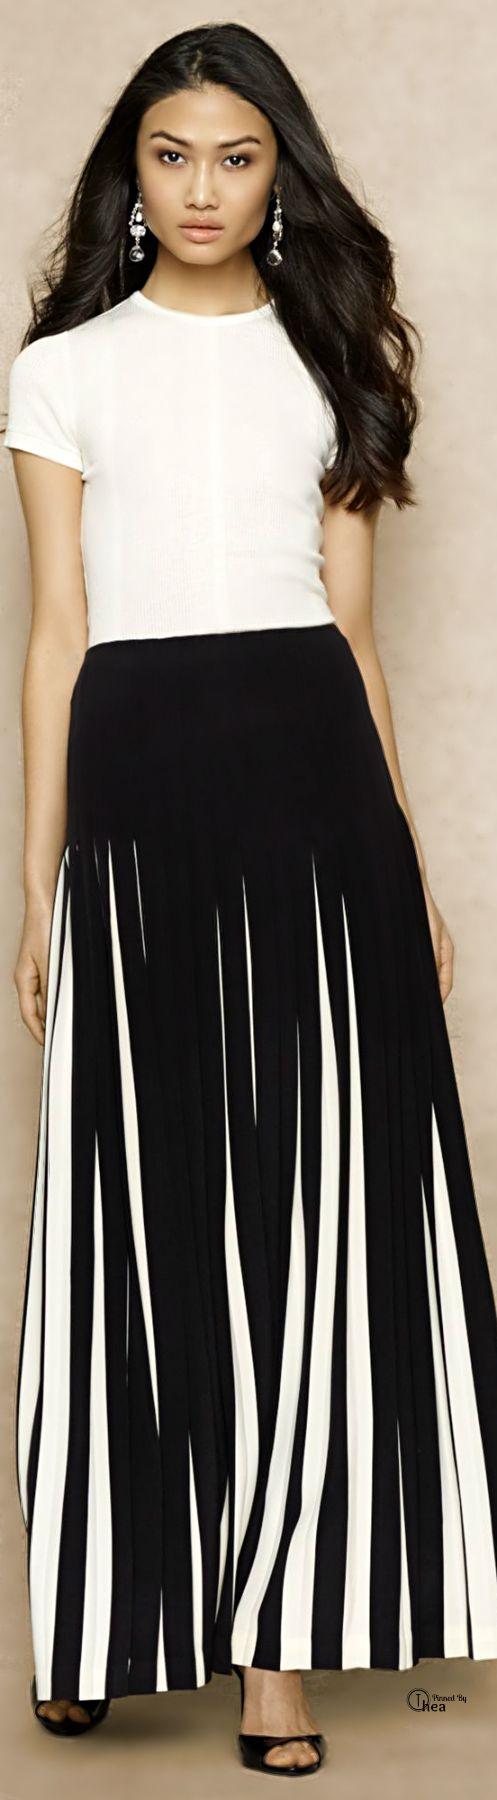 33 best Black or White Maxi Skirts images on Pinterest | Long ...